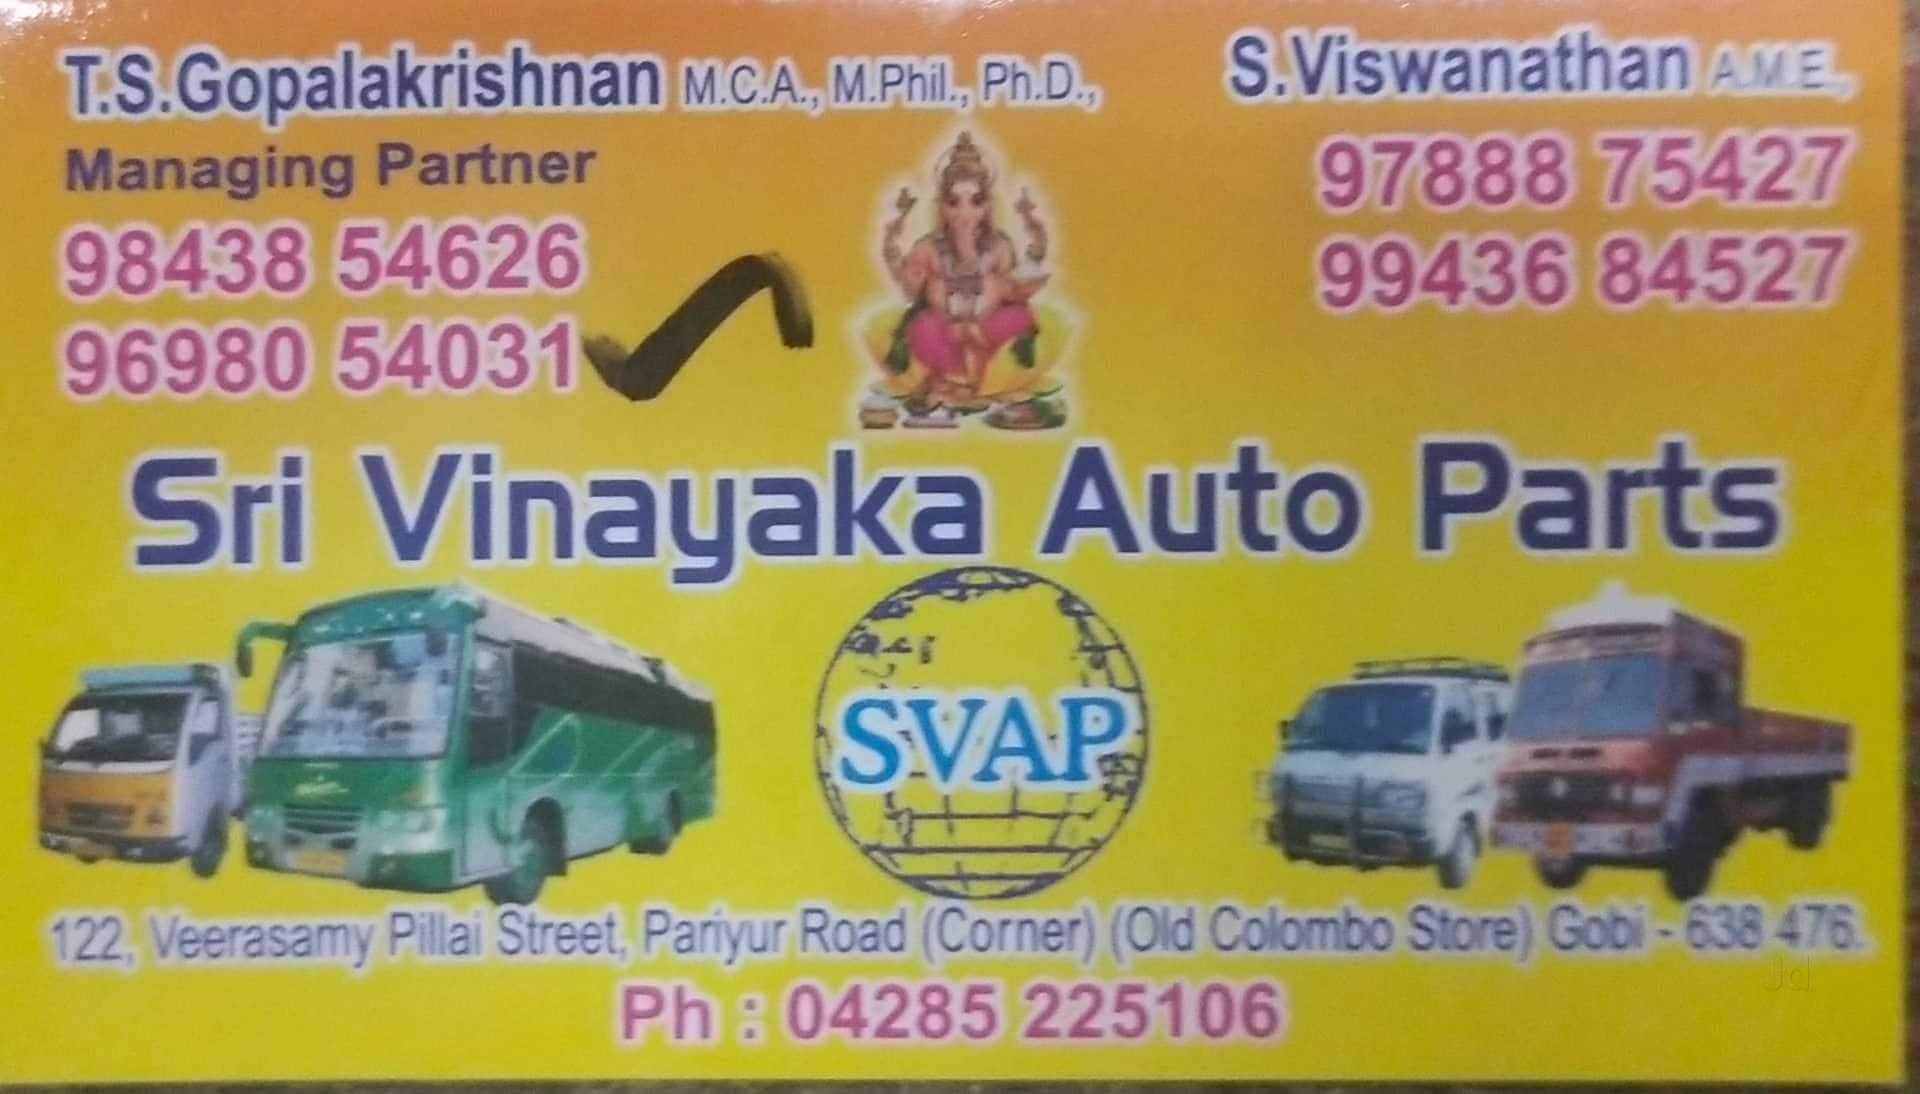 Automobile Parts in Nambiyur, Gobichettipalayam - Car Parts